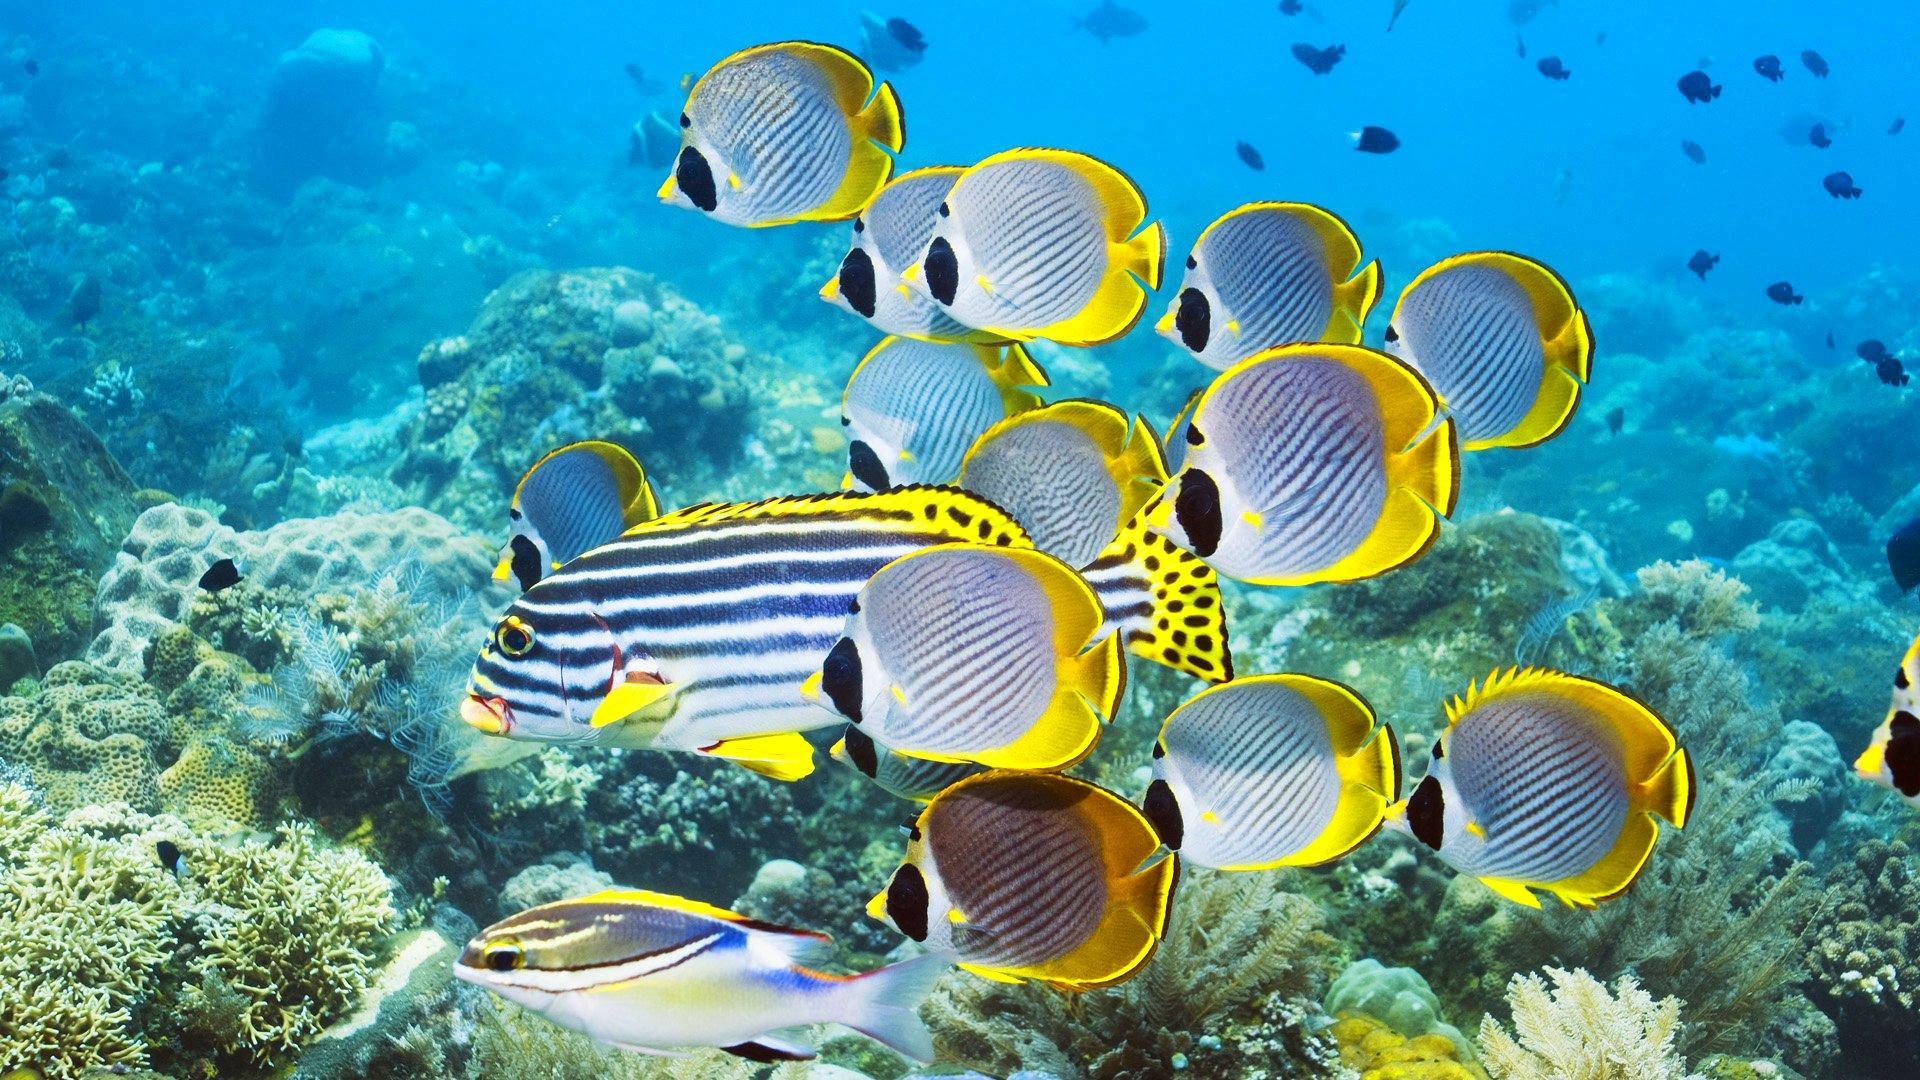 Картинки из морских ракушек фото окне можно